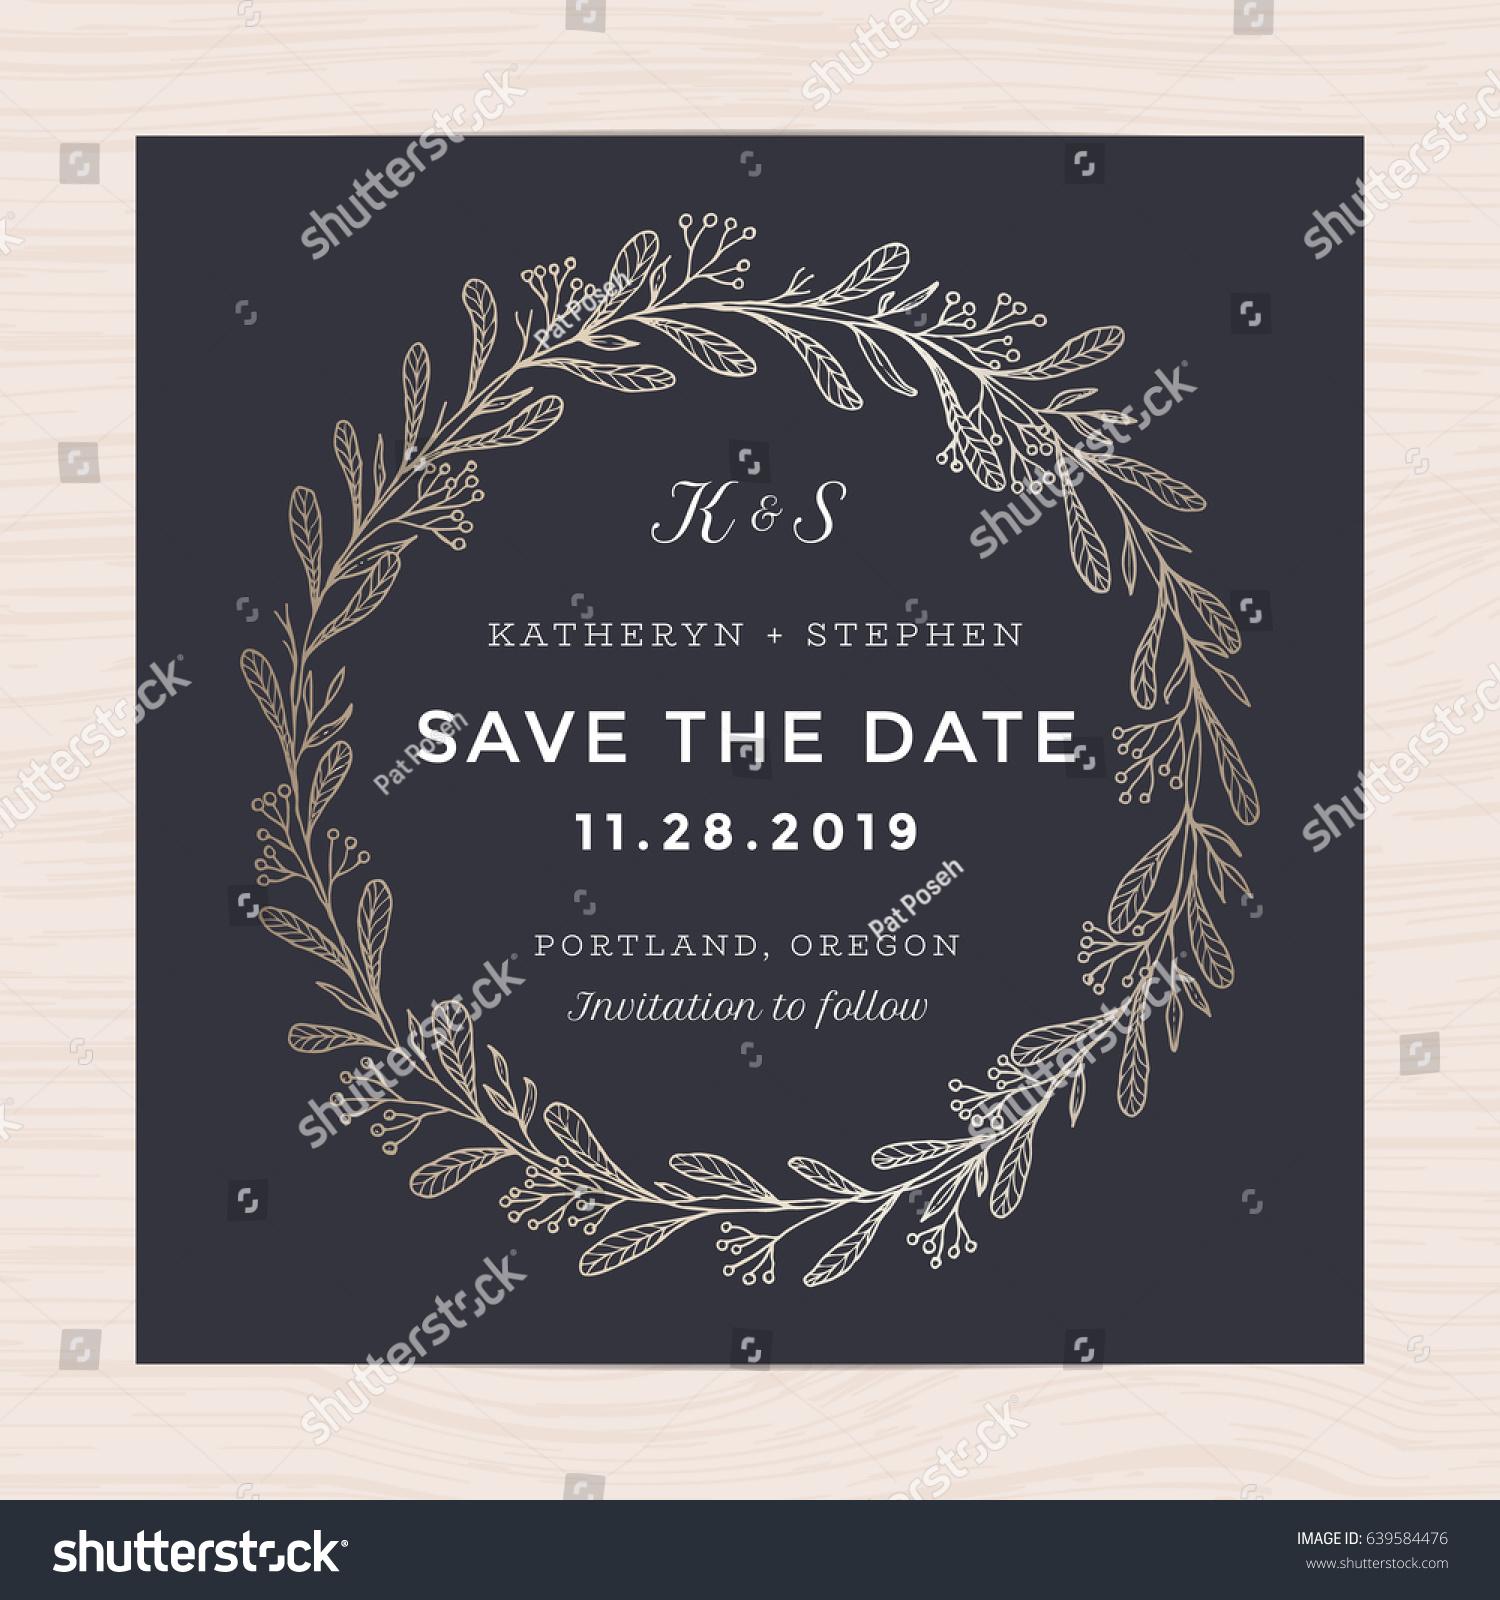 5 Blue Floral Wedding Invitation Card Vector Material: Elegant Floral Wreath Wedding Invitation Card Stock Vector